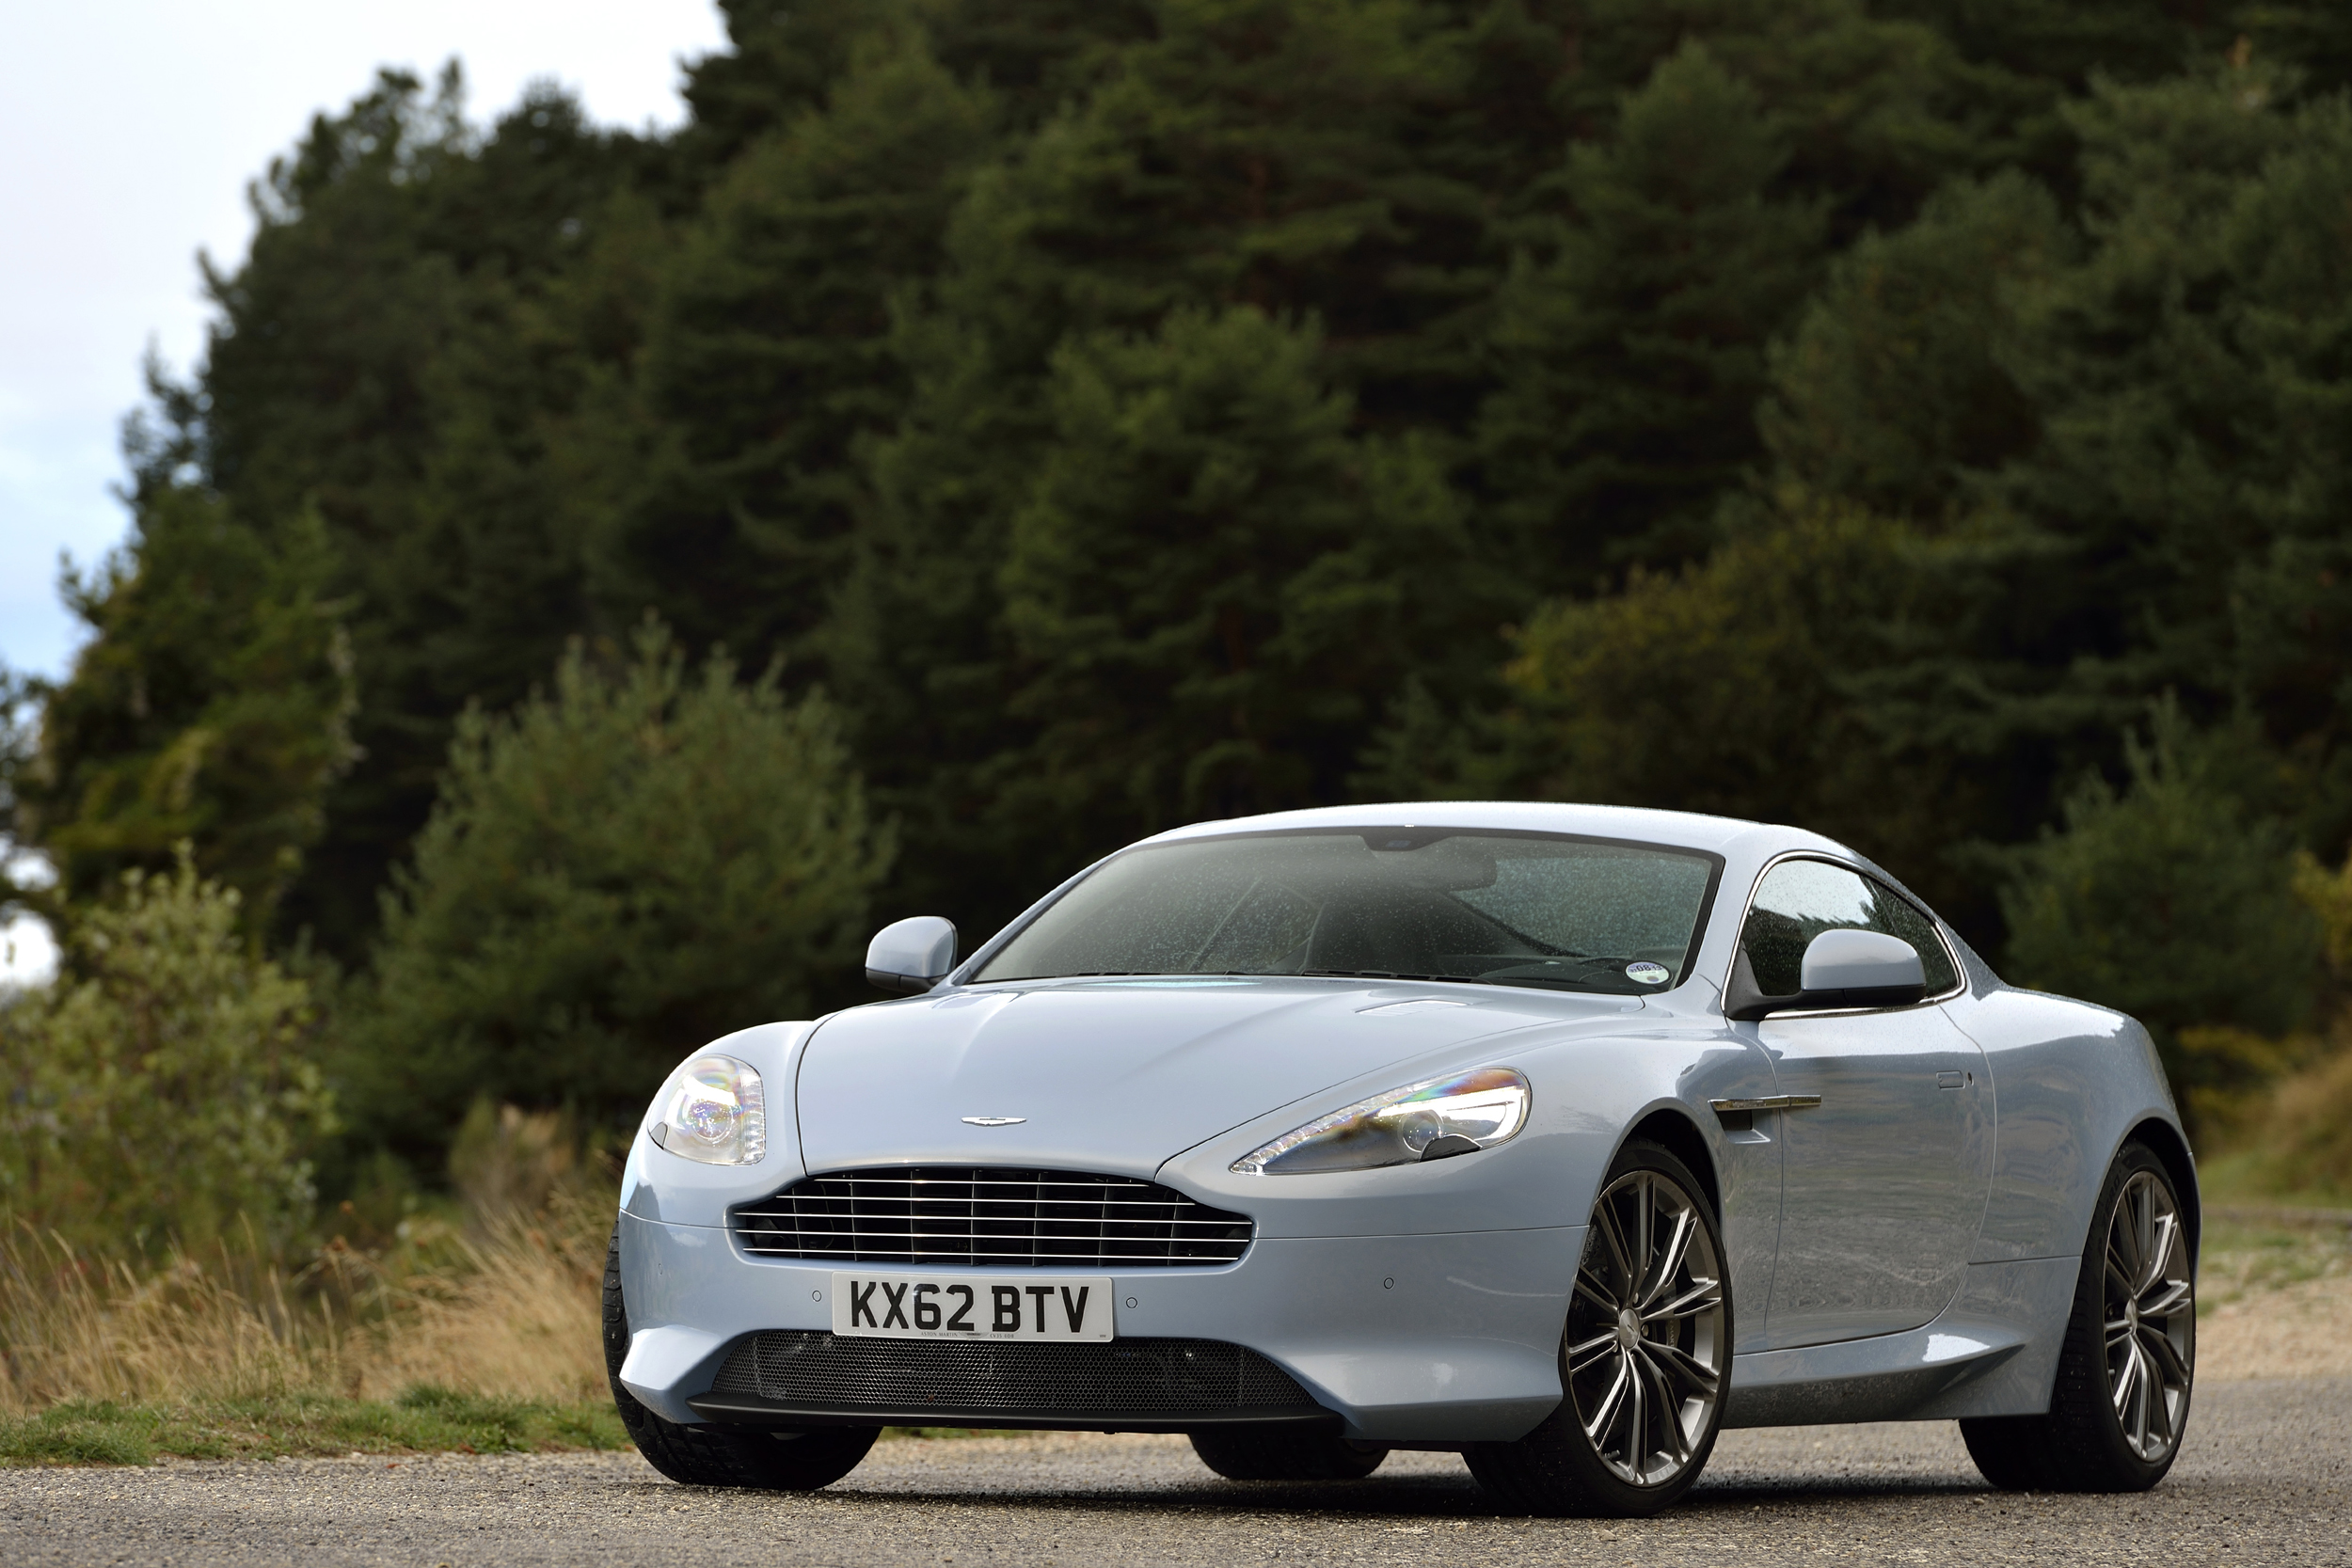 Aston Martin DB9 2016 International Price & Overview